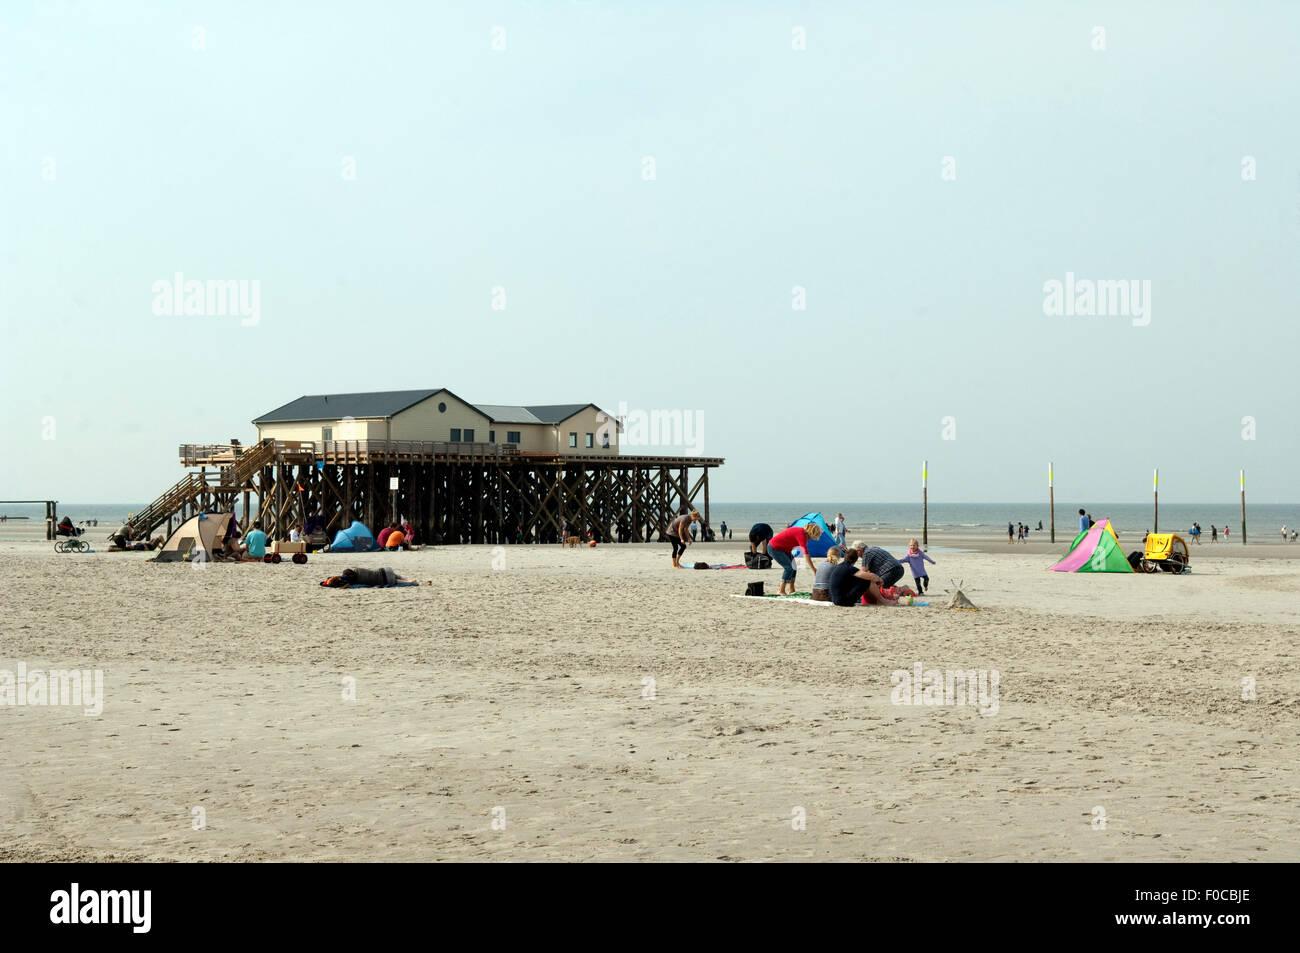 Strand, Sankt Peter-Ording, - DEU, Deutschland, - Stock Image